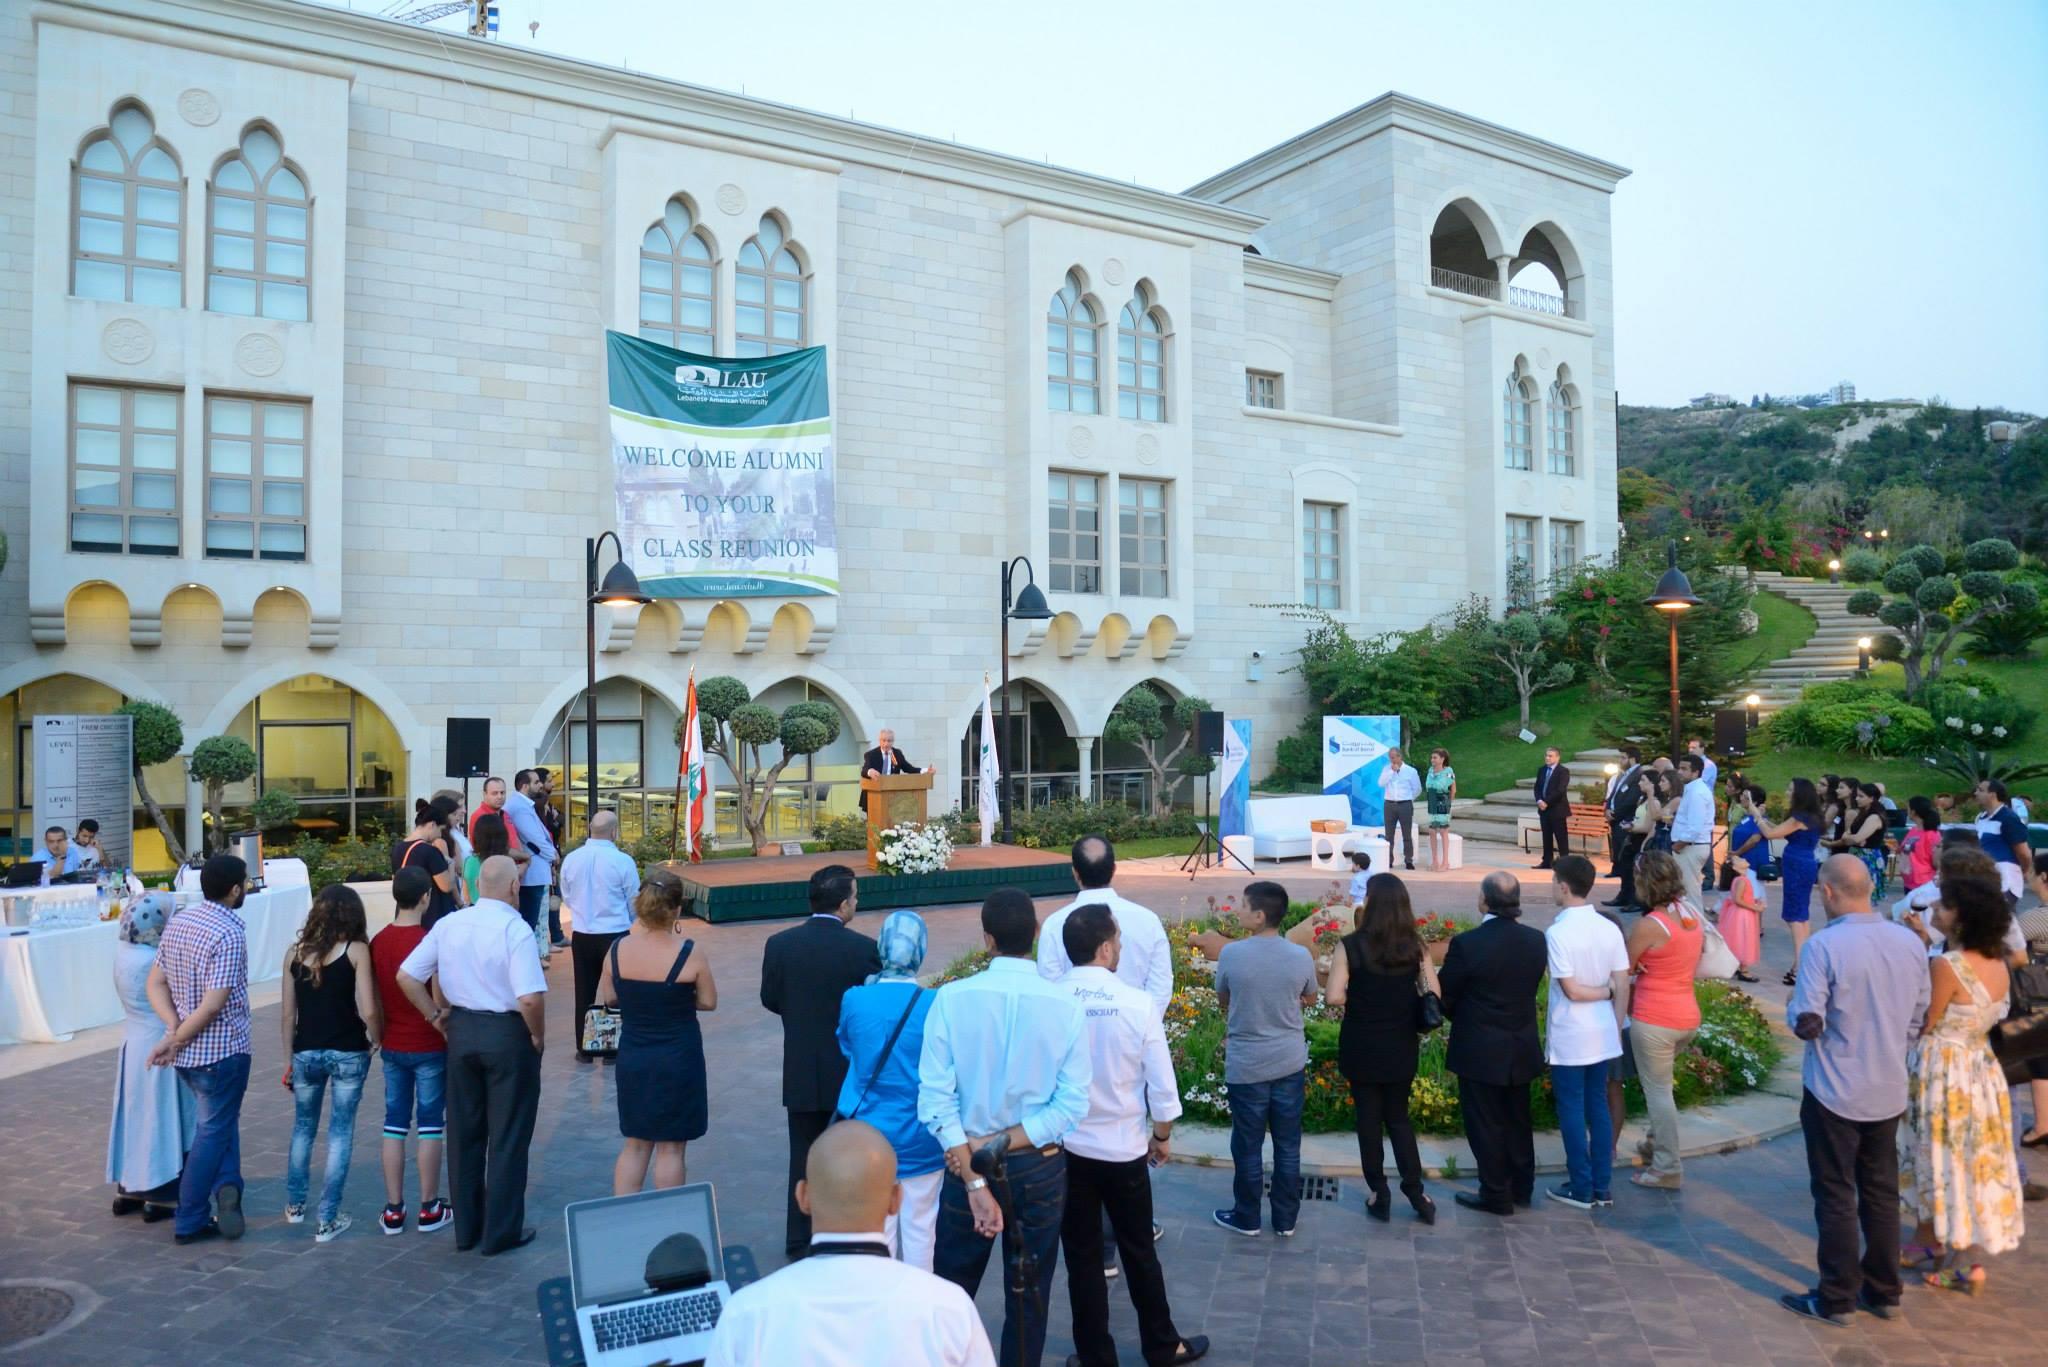 Alumni Homecoming & Reunions 2015 - Byblos.jpg